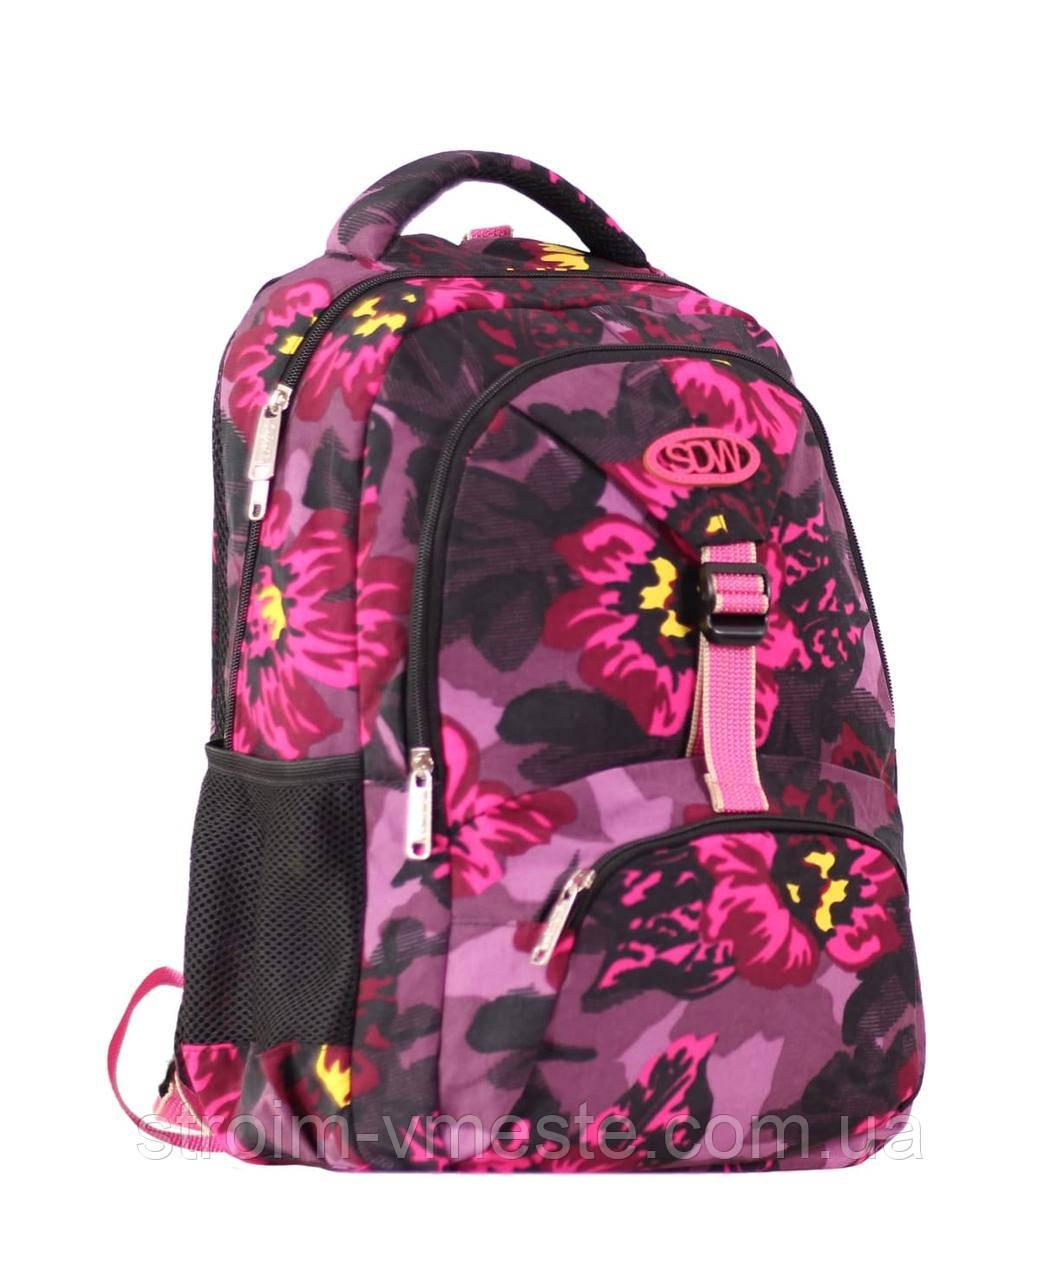 Рюкзак 3 отд 43*27*17 см 900D PL SAFARI Trend 1847